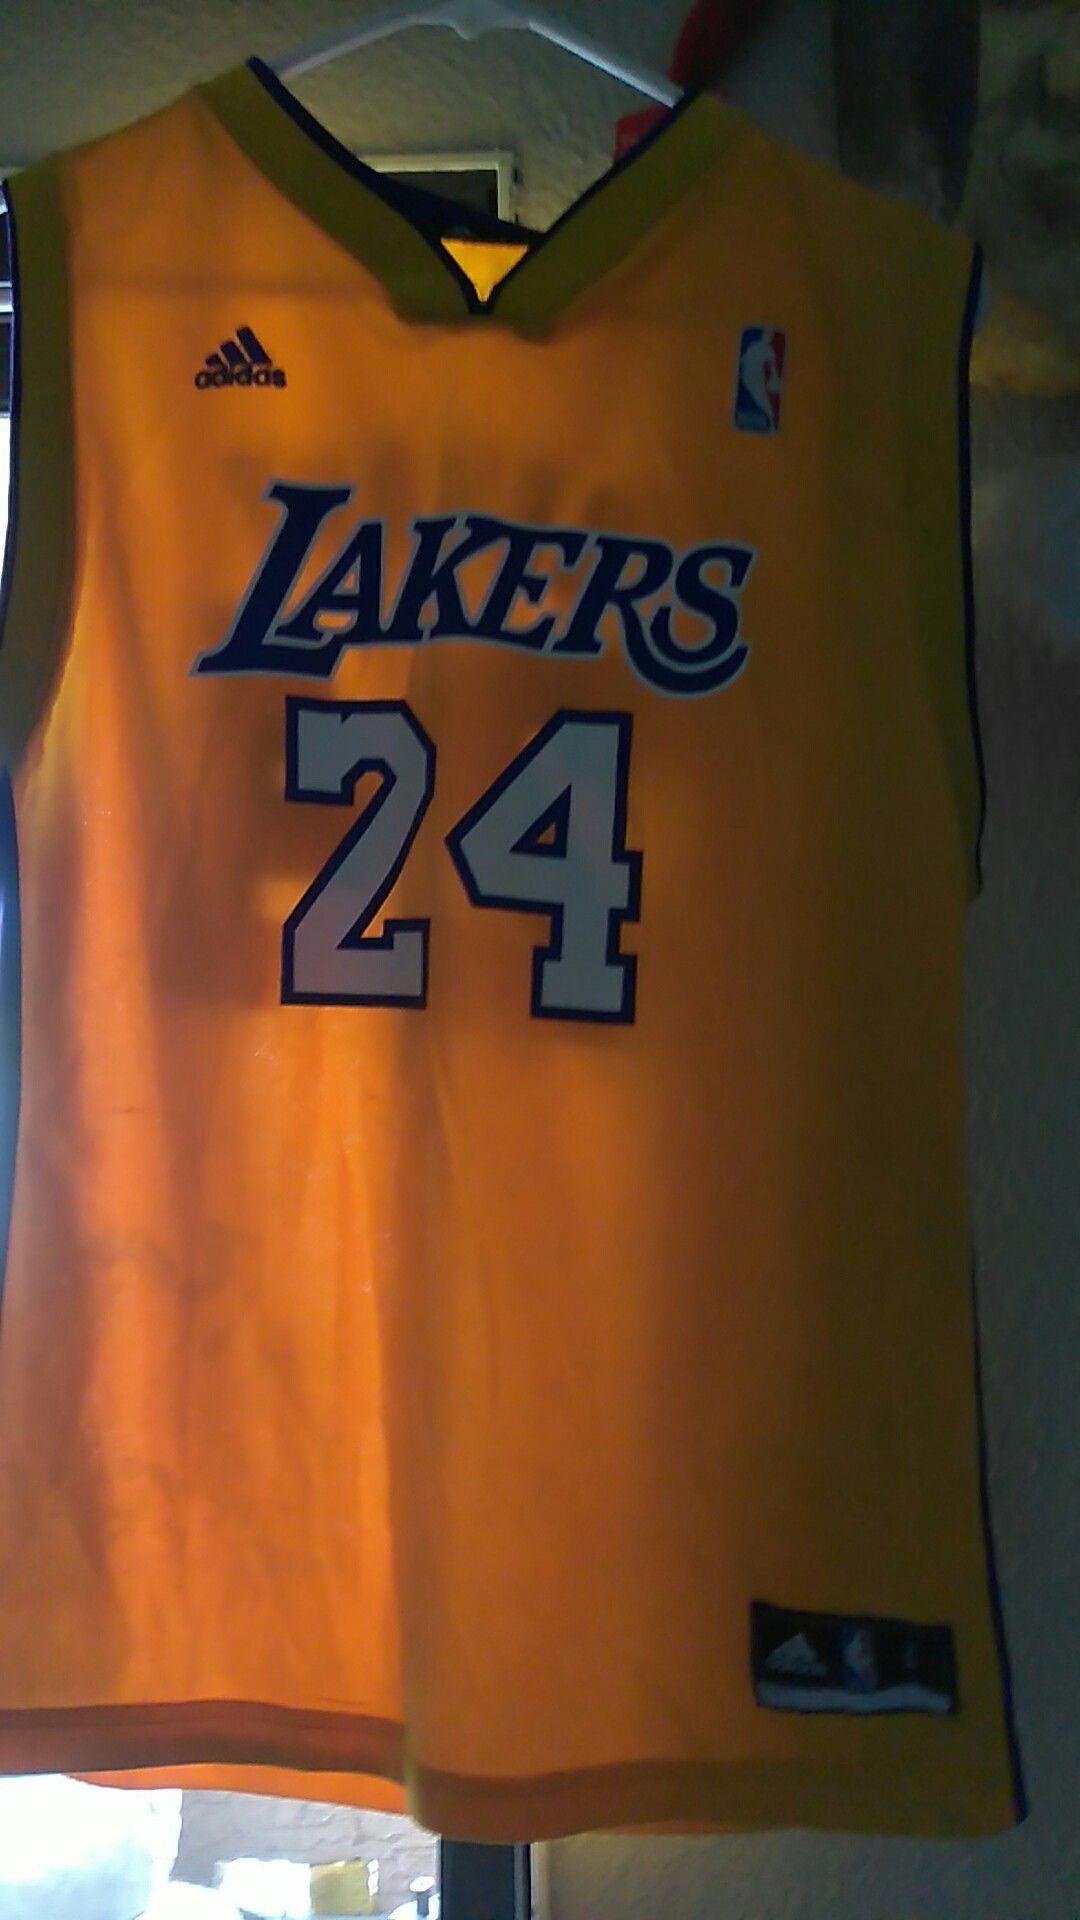 Addidas Kobe Bryant jersey